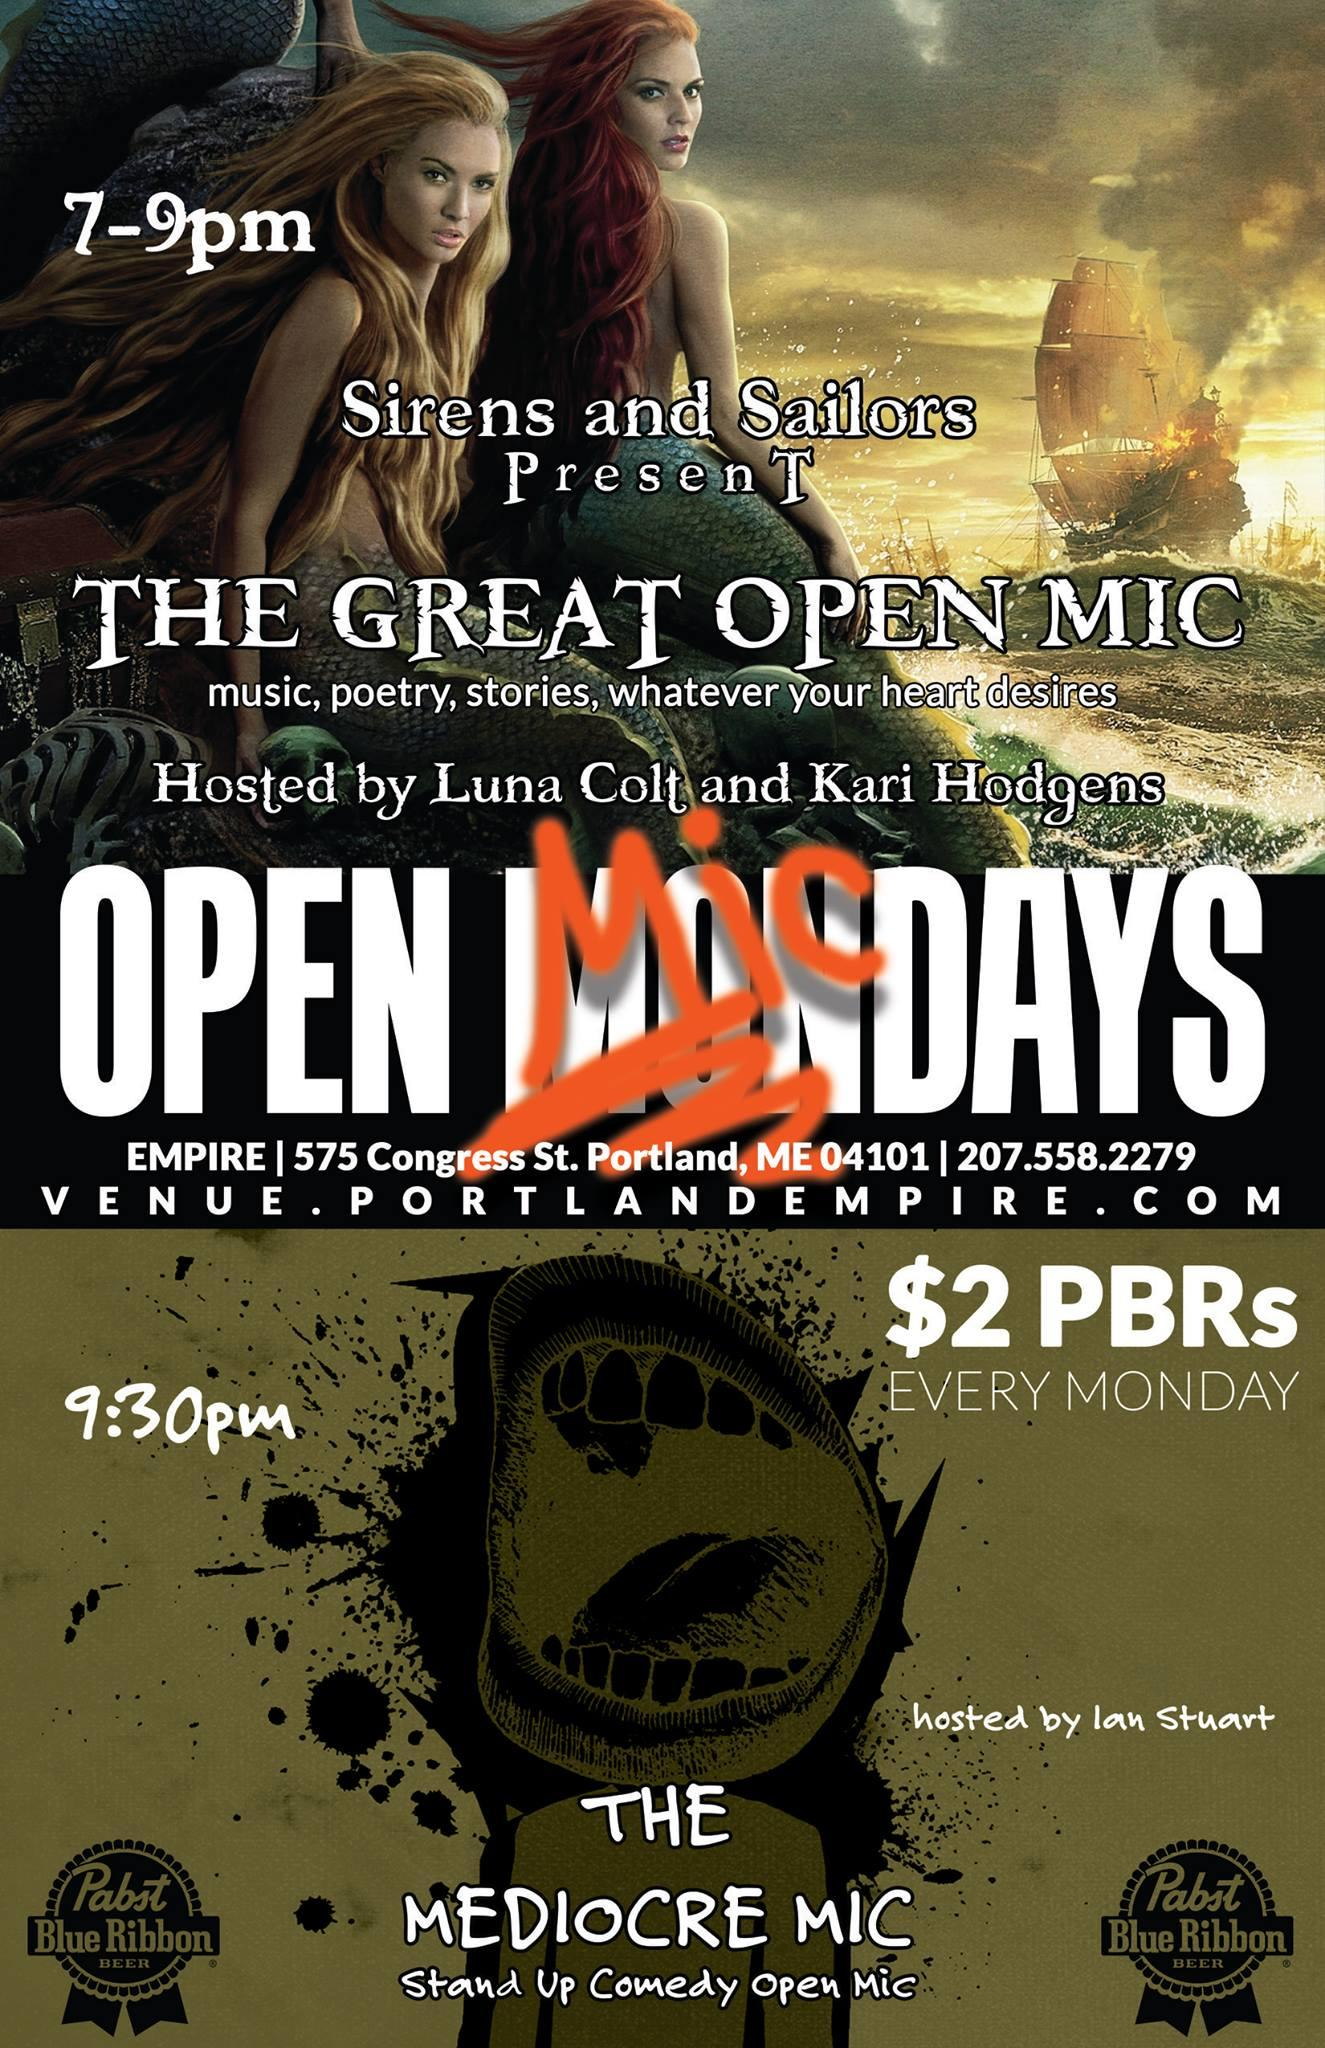 Open Micdays!